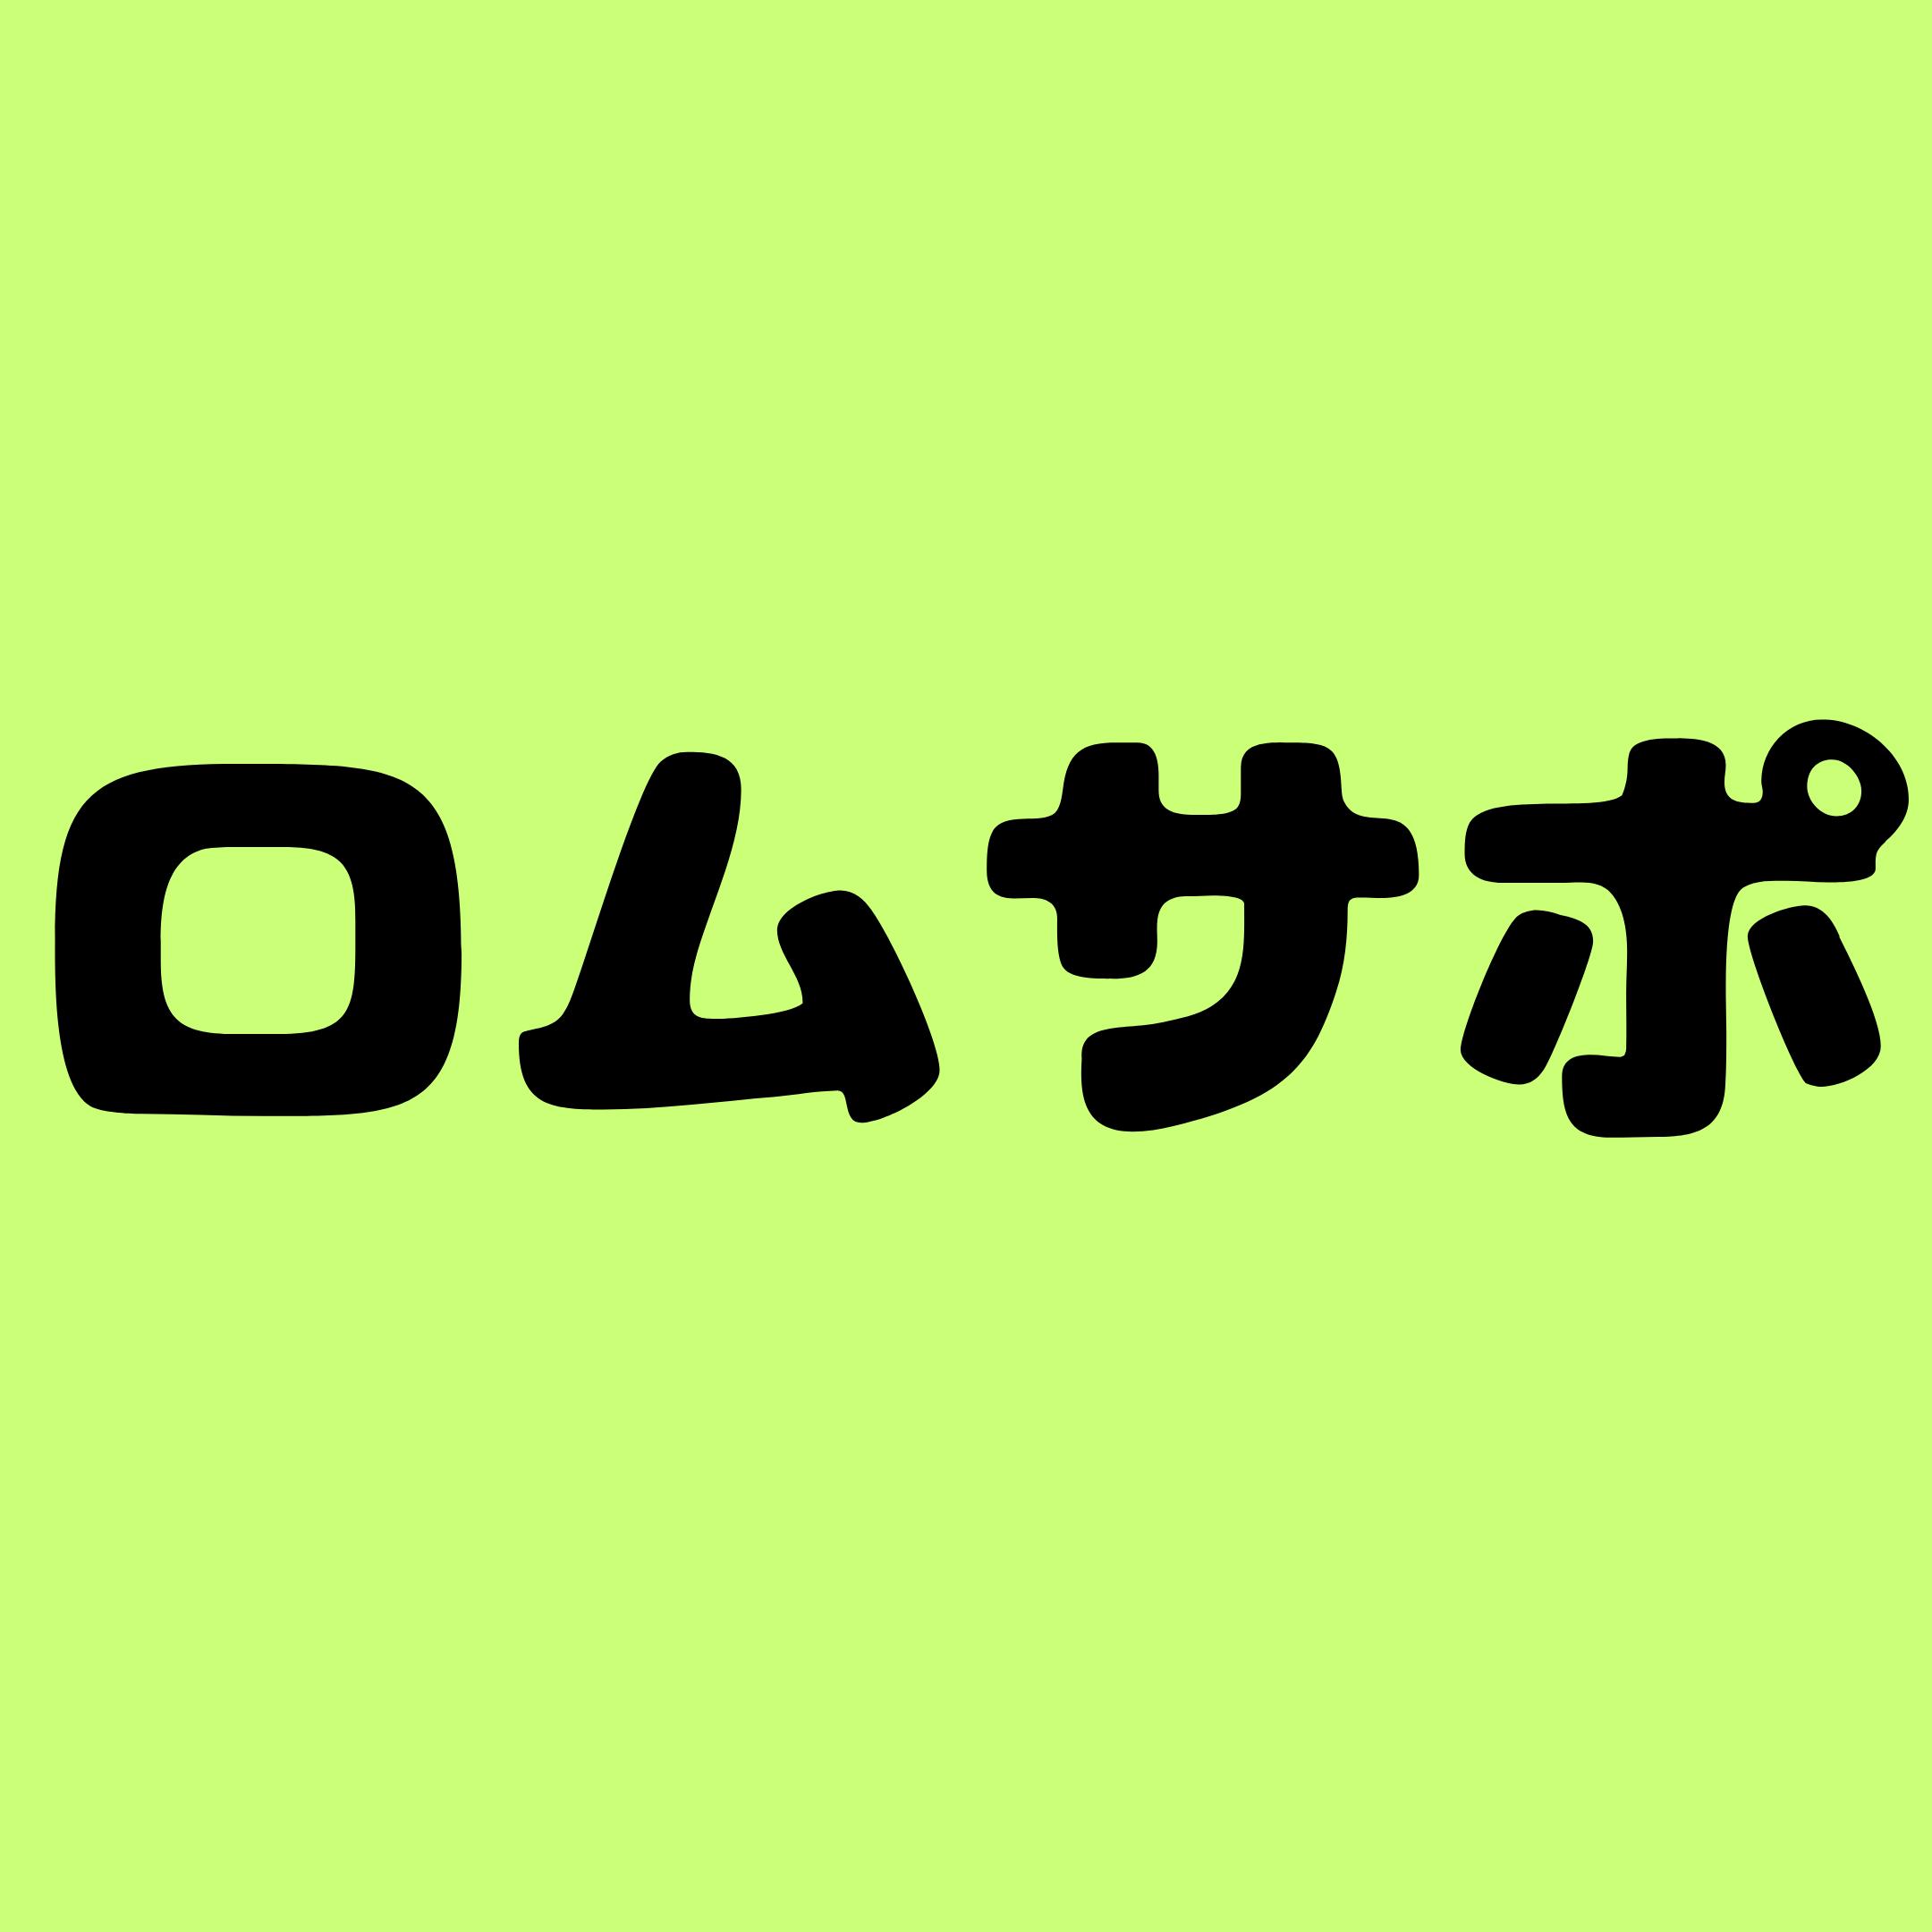 20200209_114000_0002